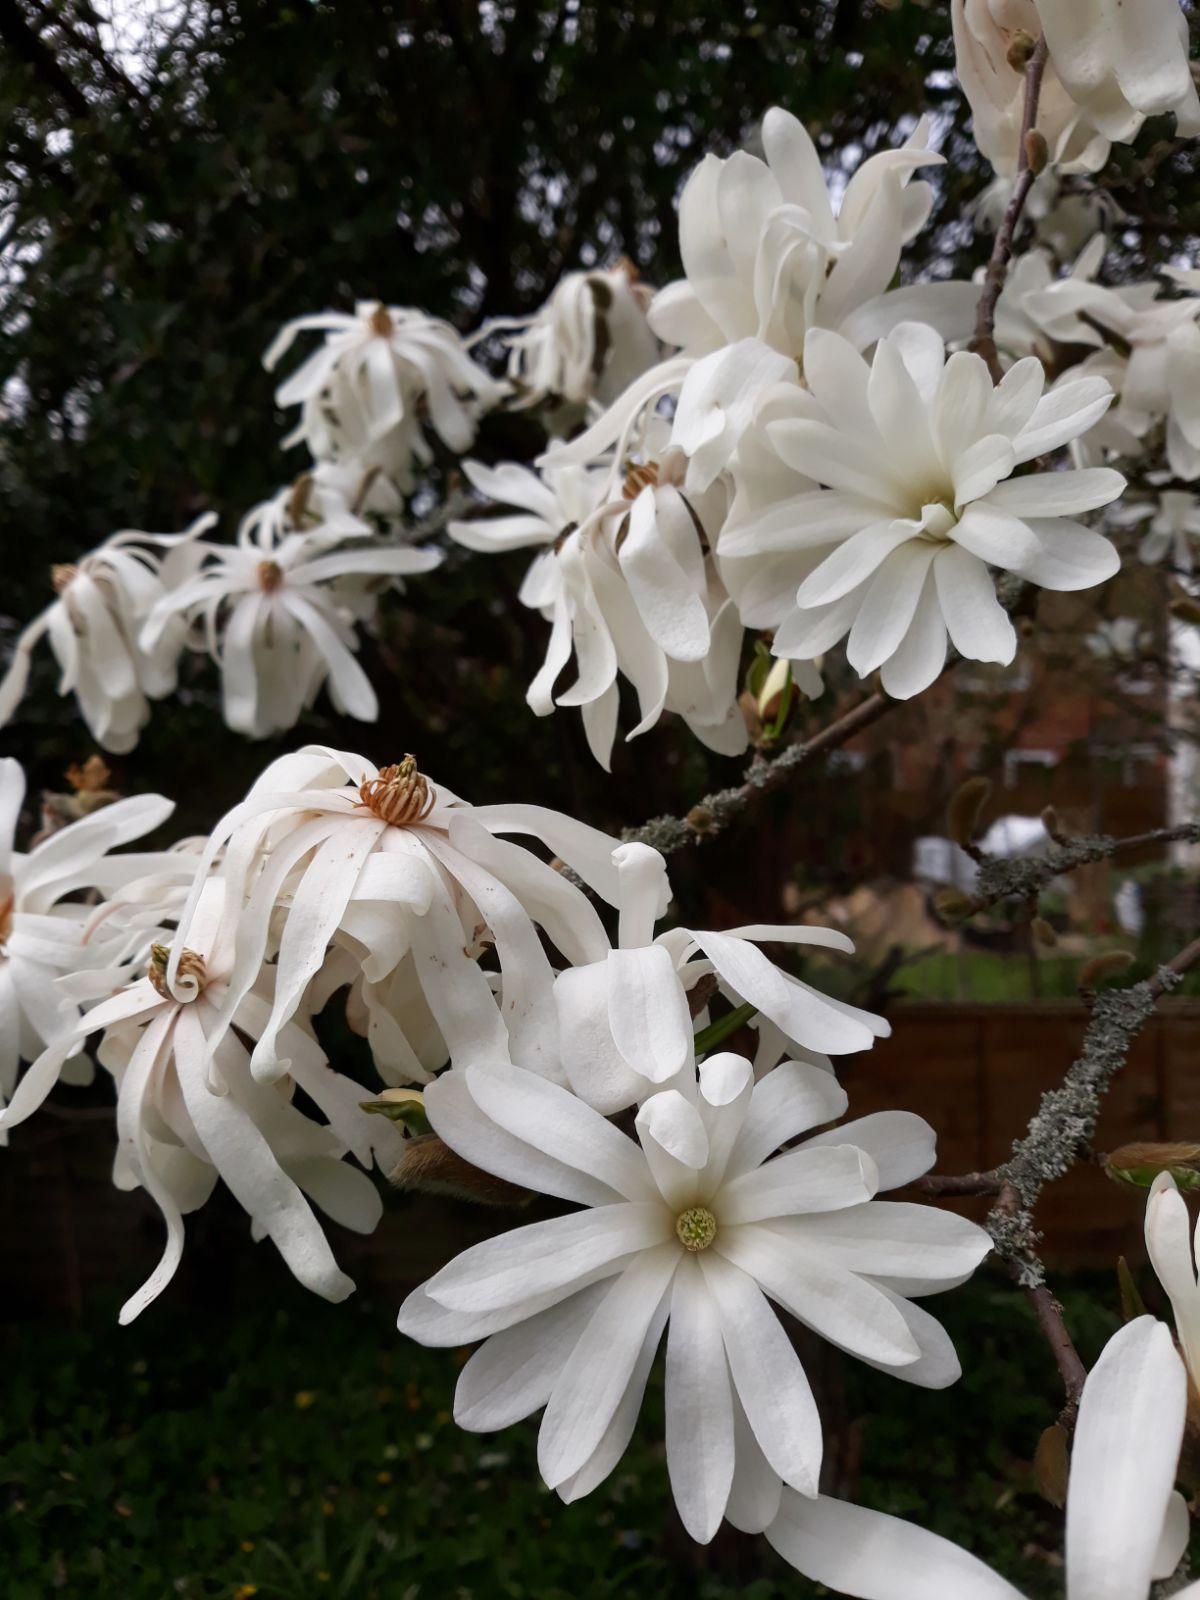 Magnolia Stellata Trees And Shrubs Online